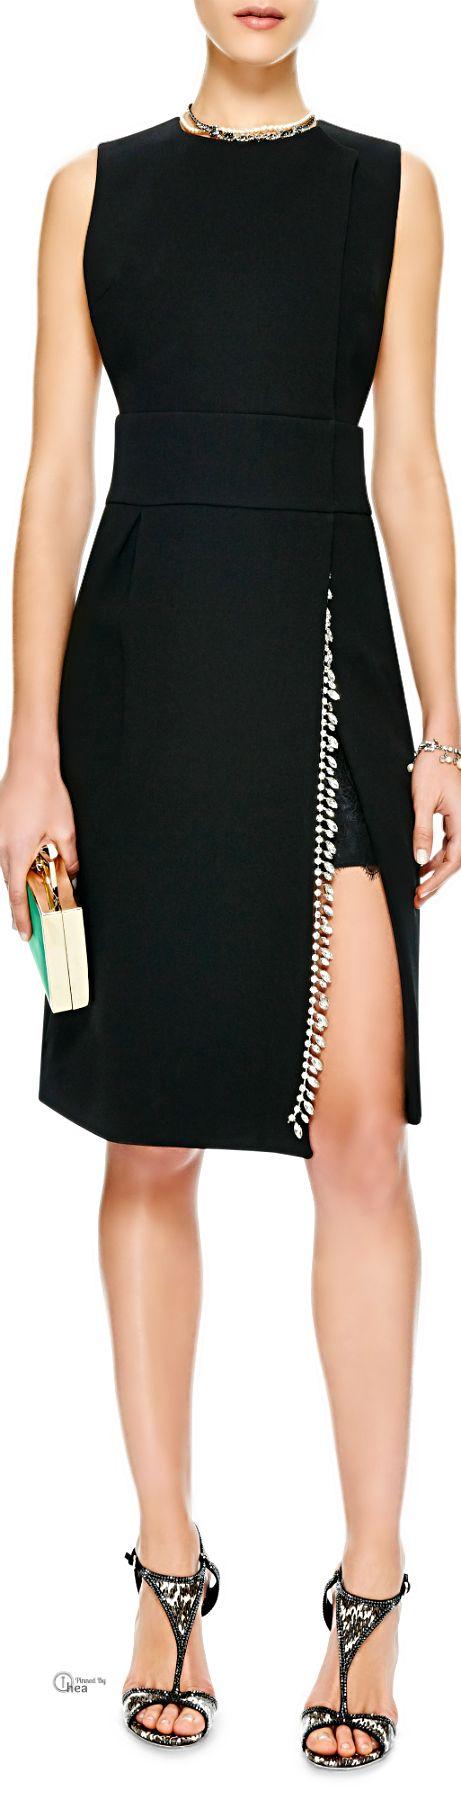 Thakoon 2014 ● Crystal-Embellished Crepe Wrap Dress